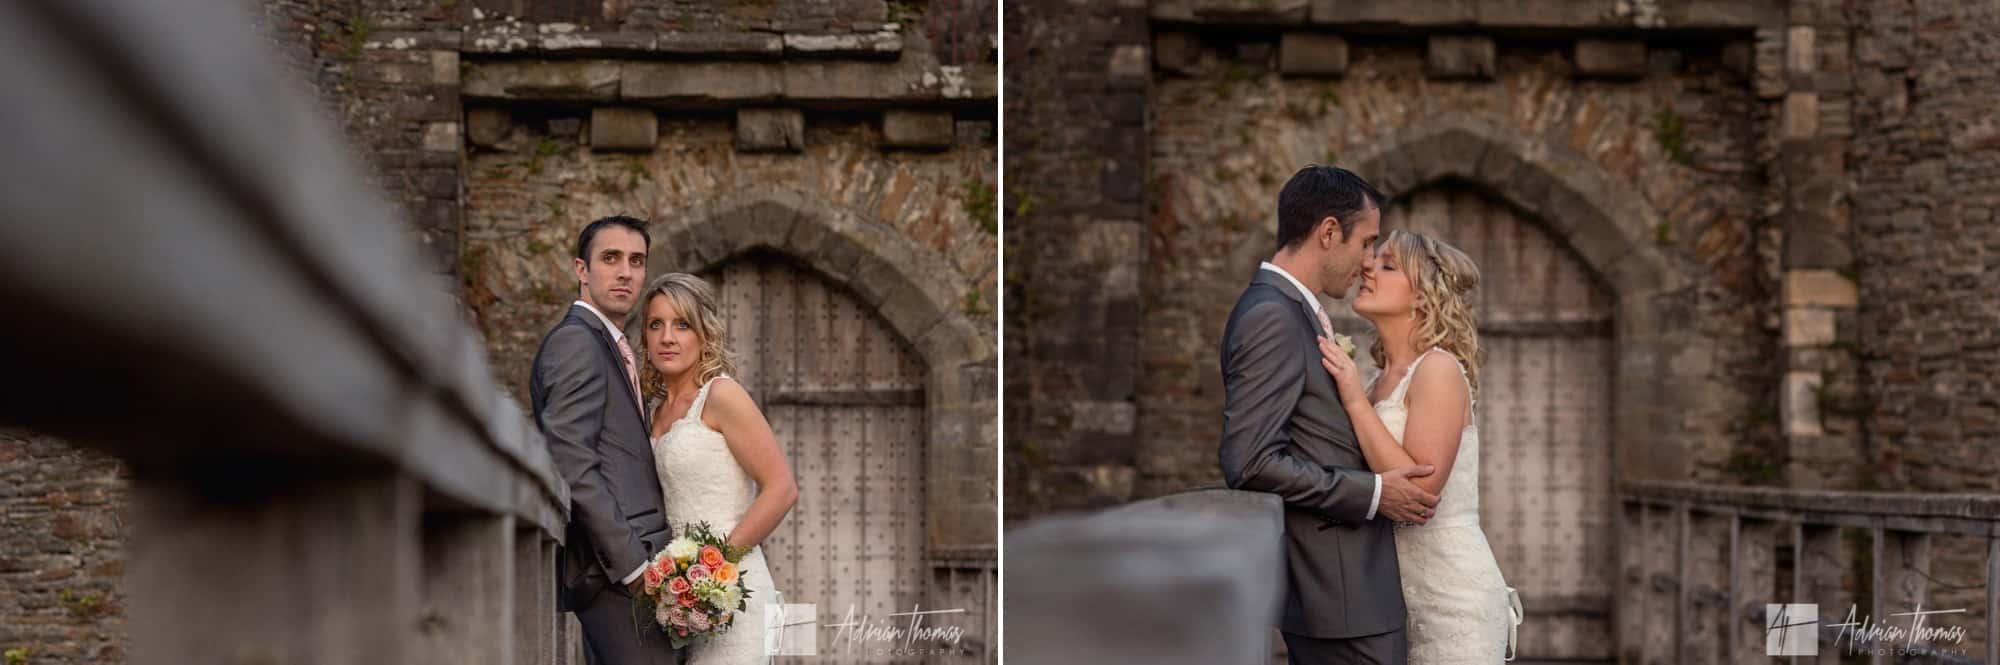 077 Caerphilly Castle Wedding